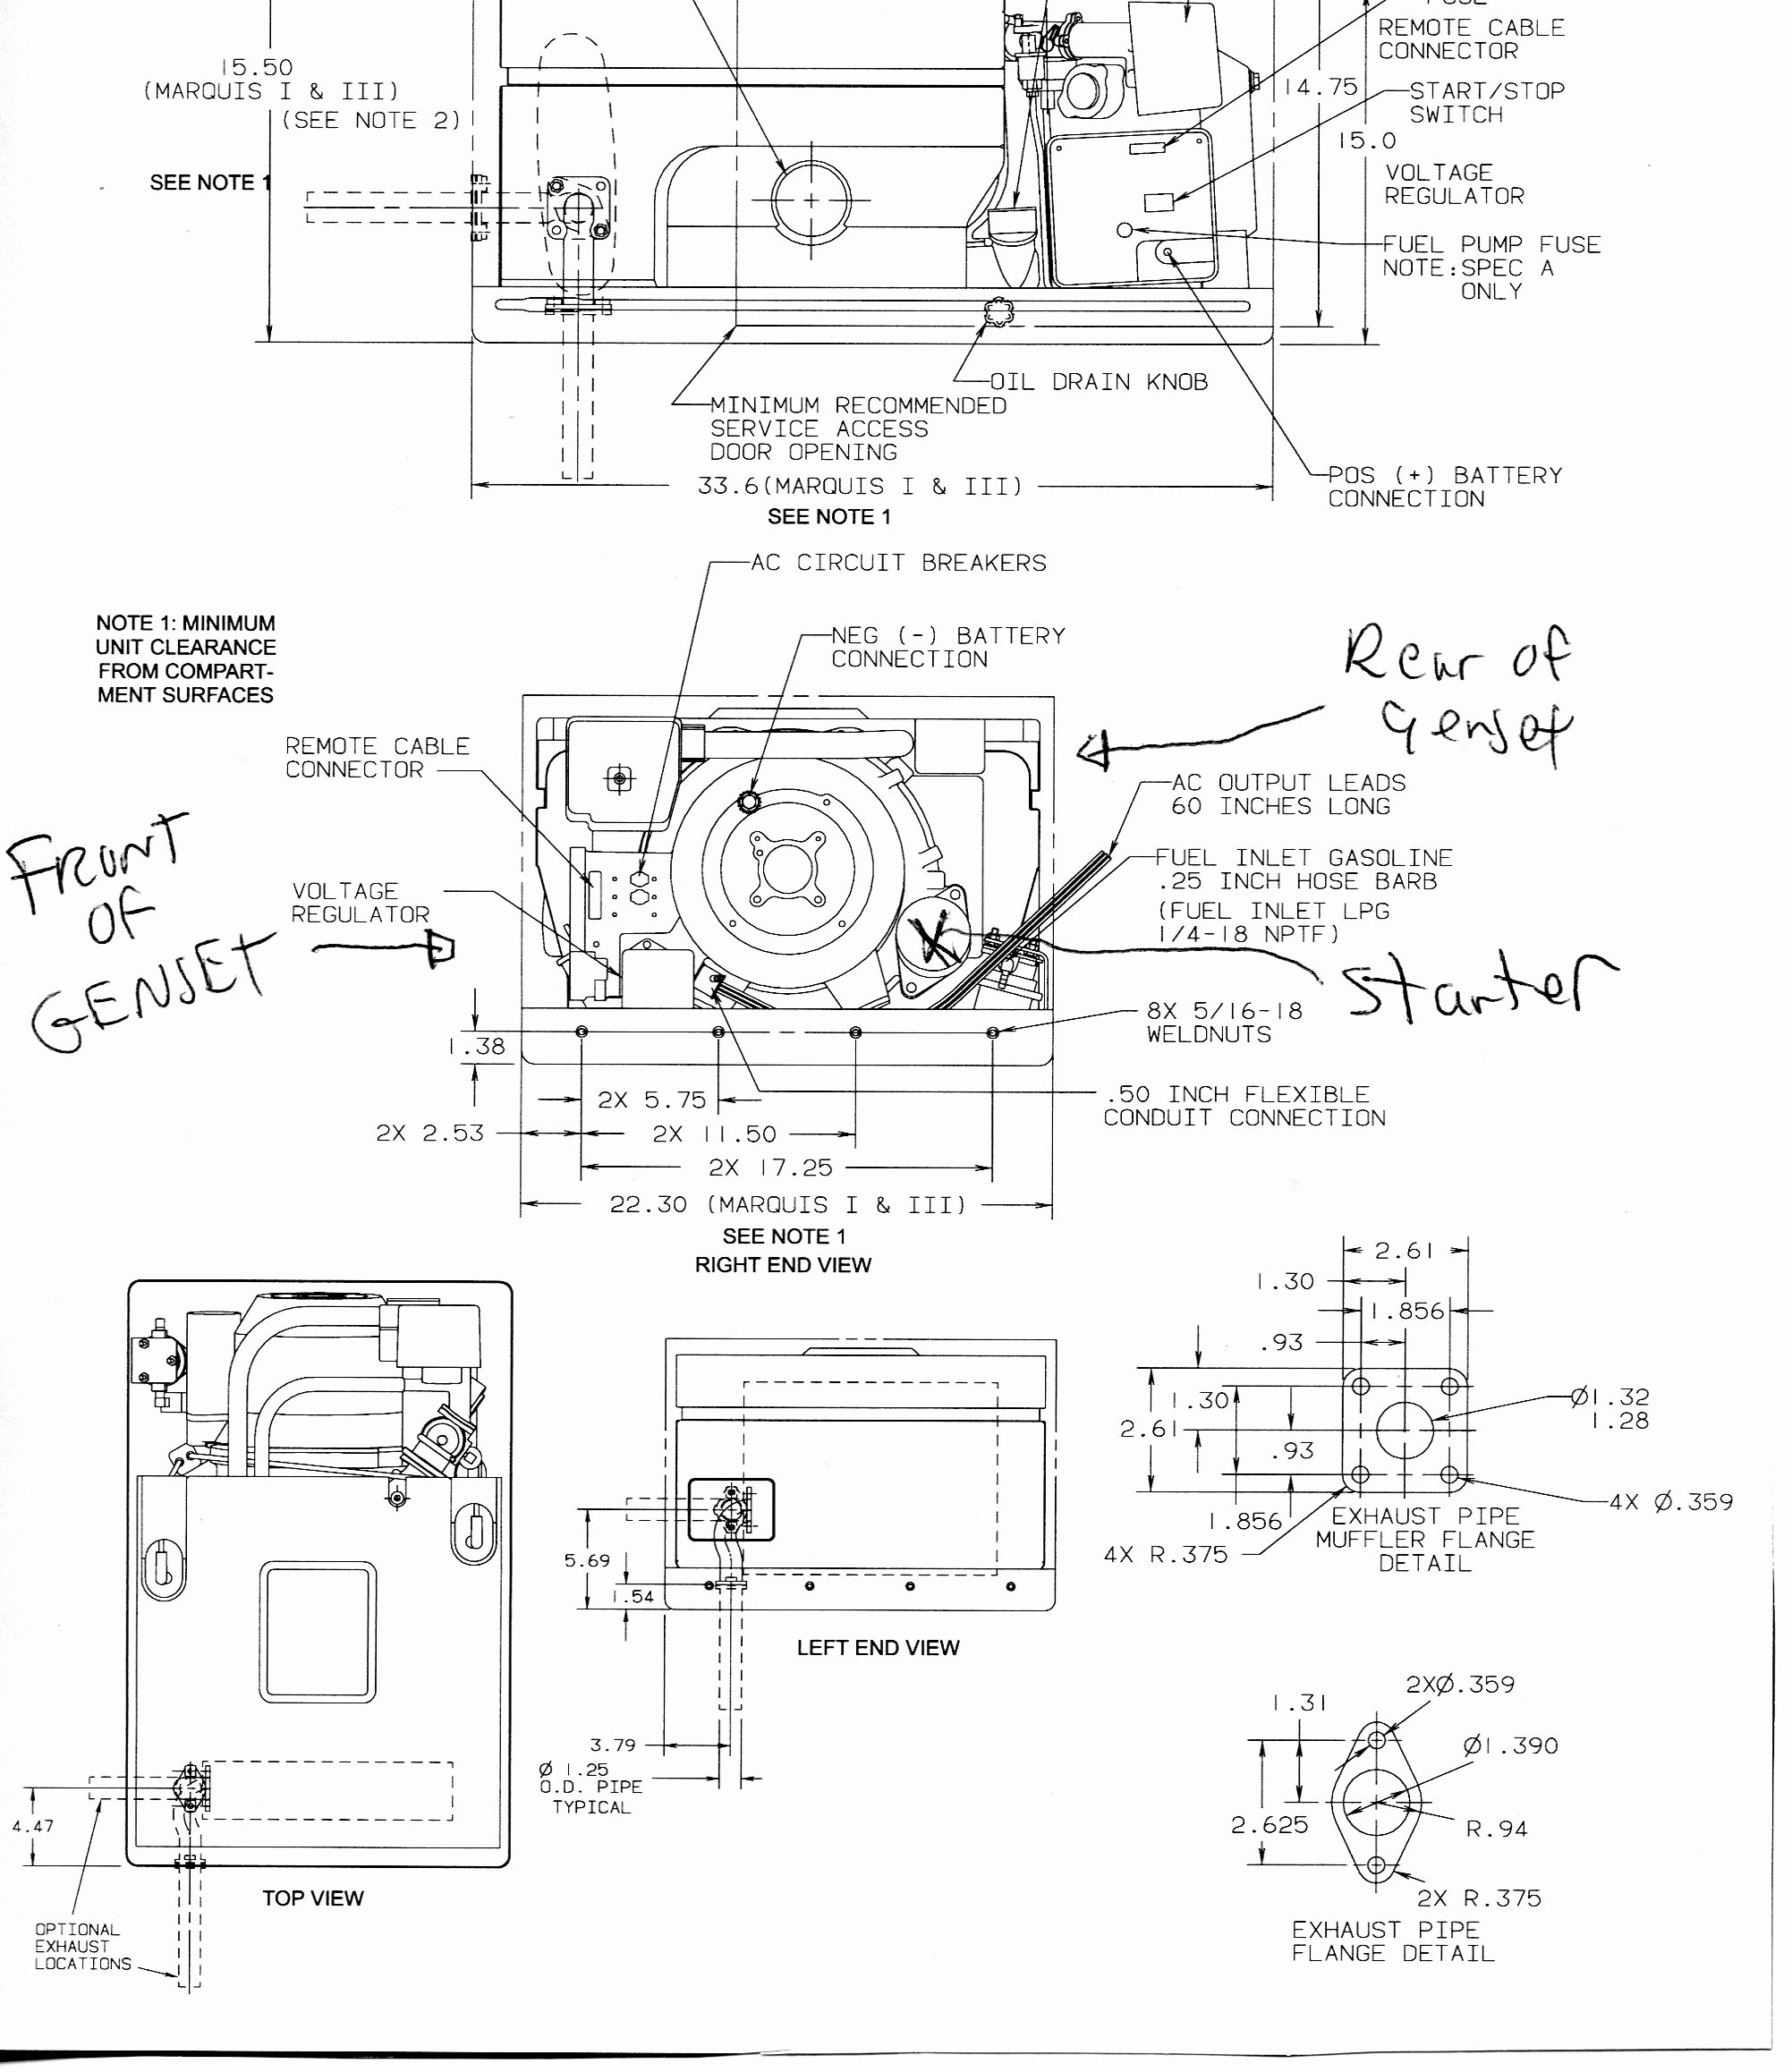 Monaco Motorhome Battery Wiring Diagram | Manual E-Books - Monaco Rv Wiring Diagram